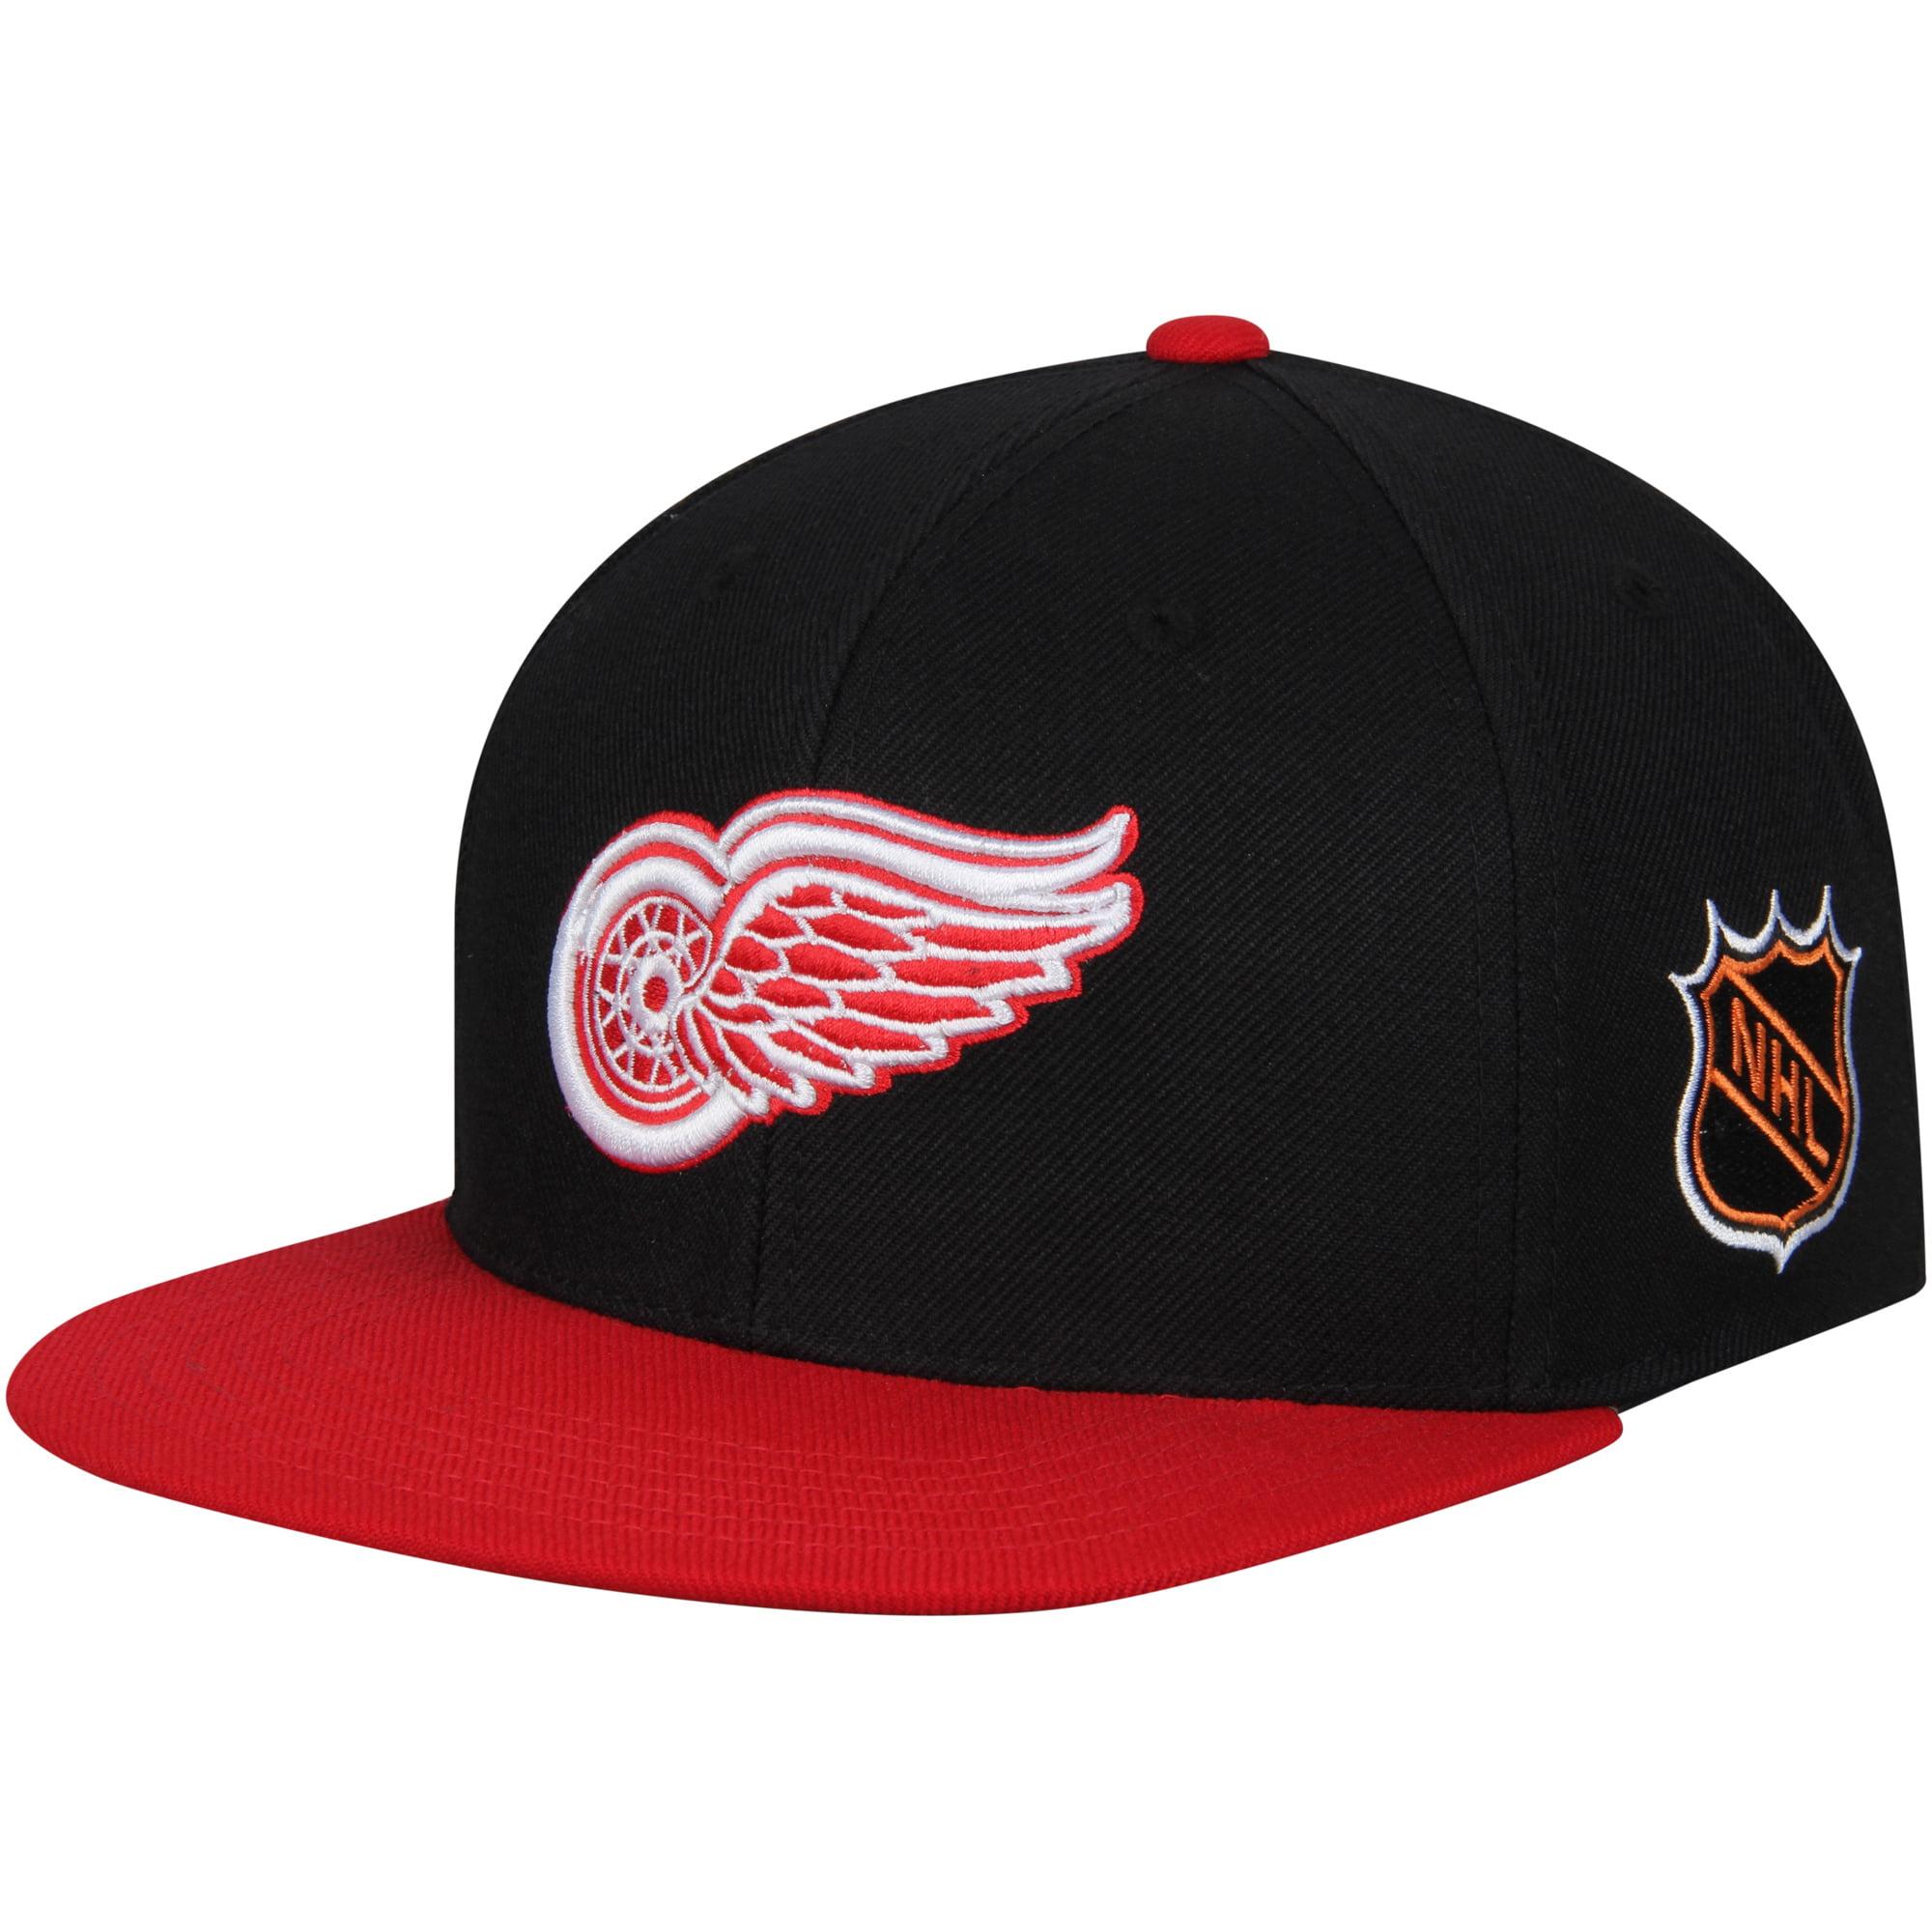 Detroit Red Wings American Needle Blockhead Snapback Adjustable Hat - Black/Red - OSFA